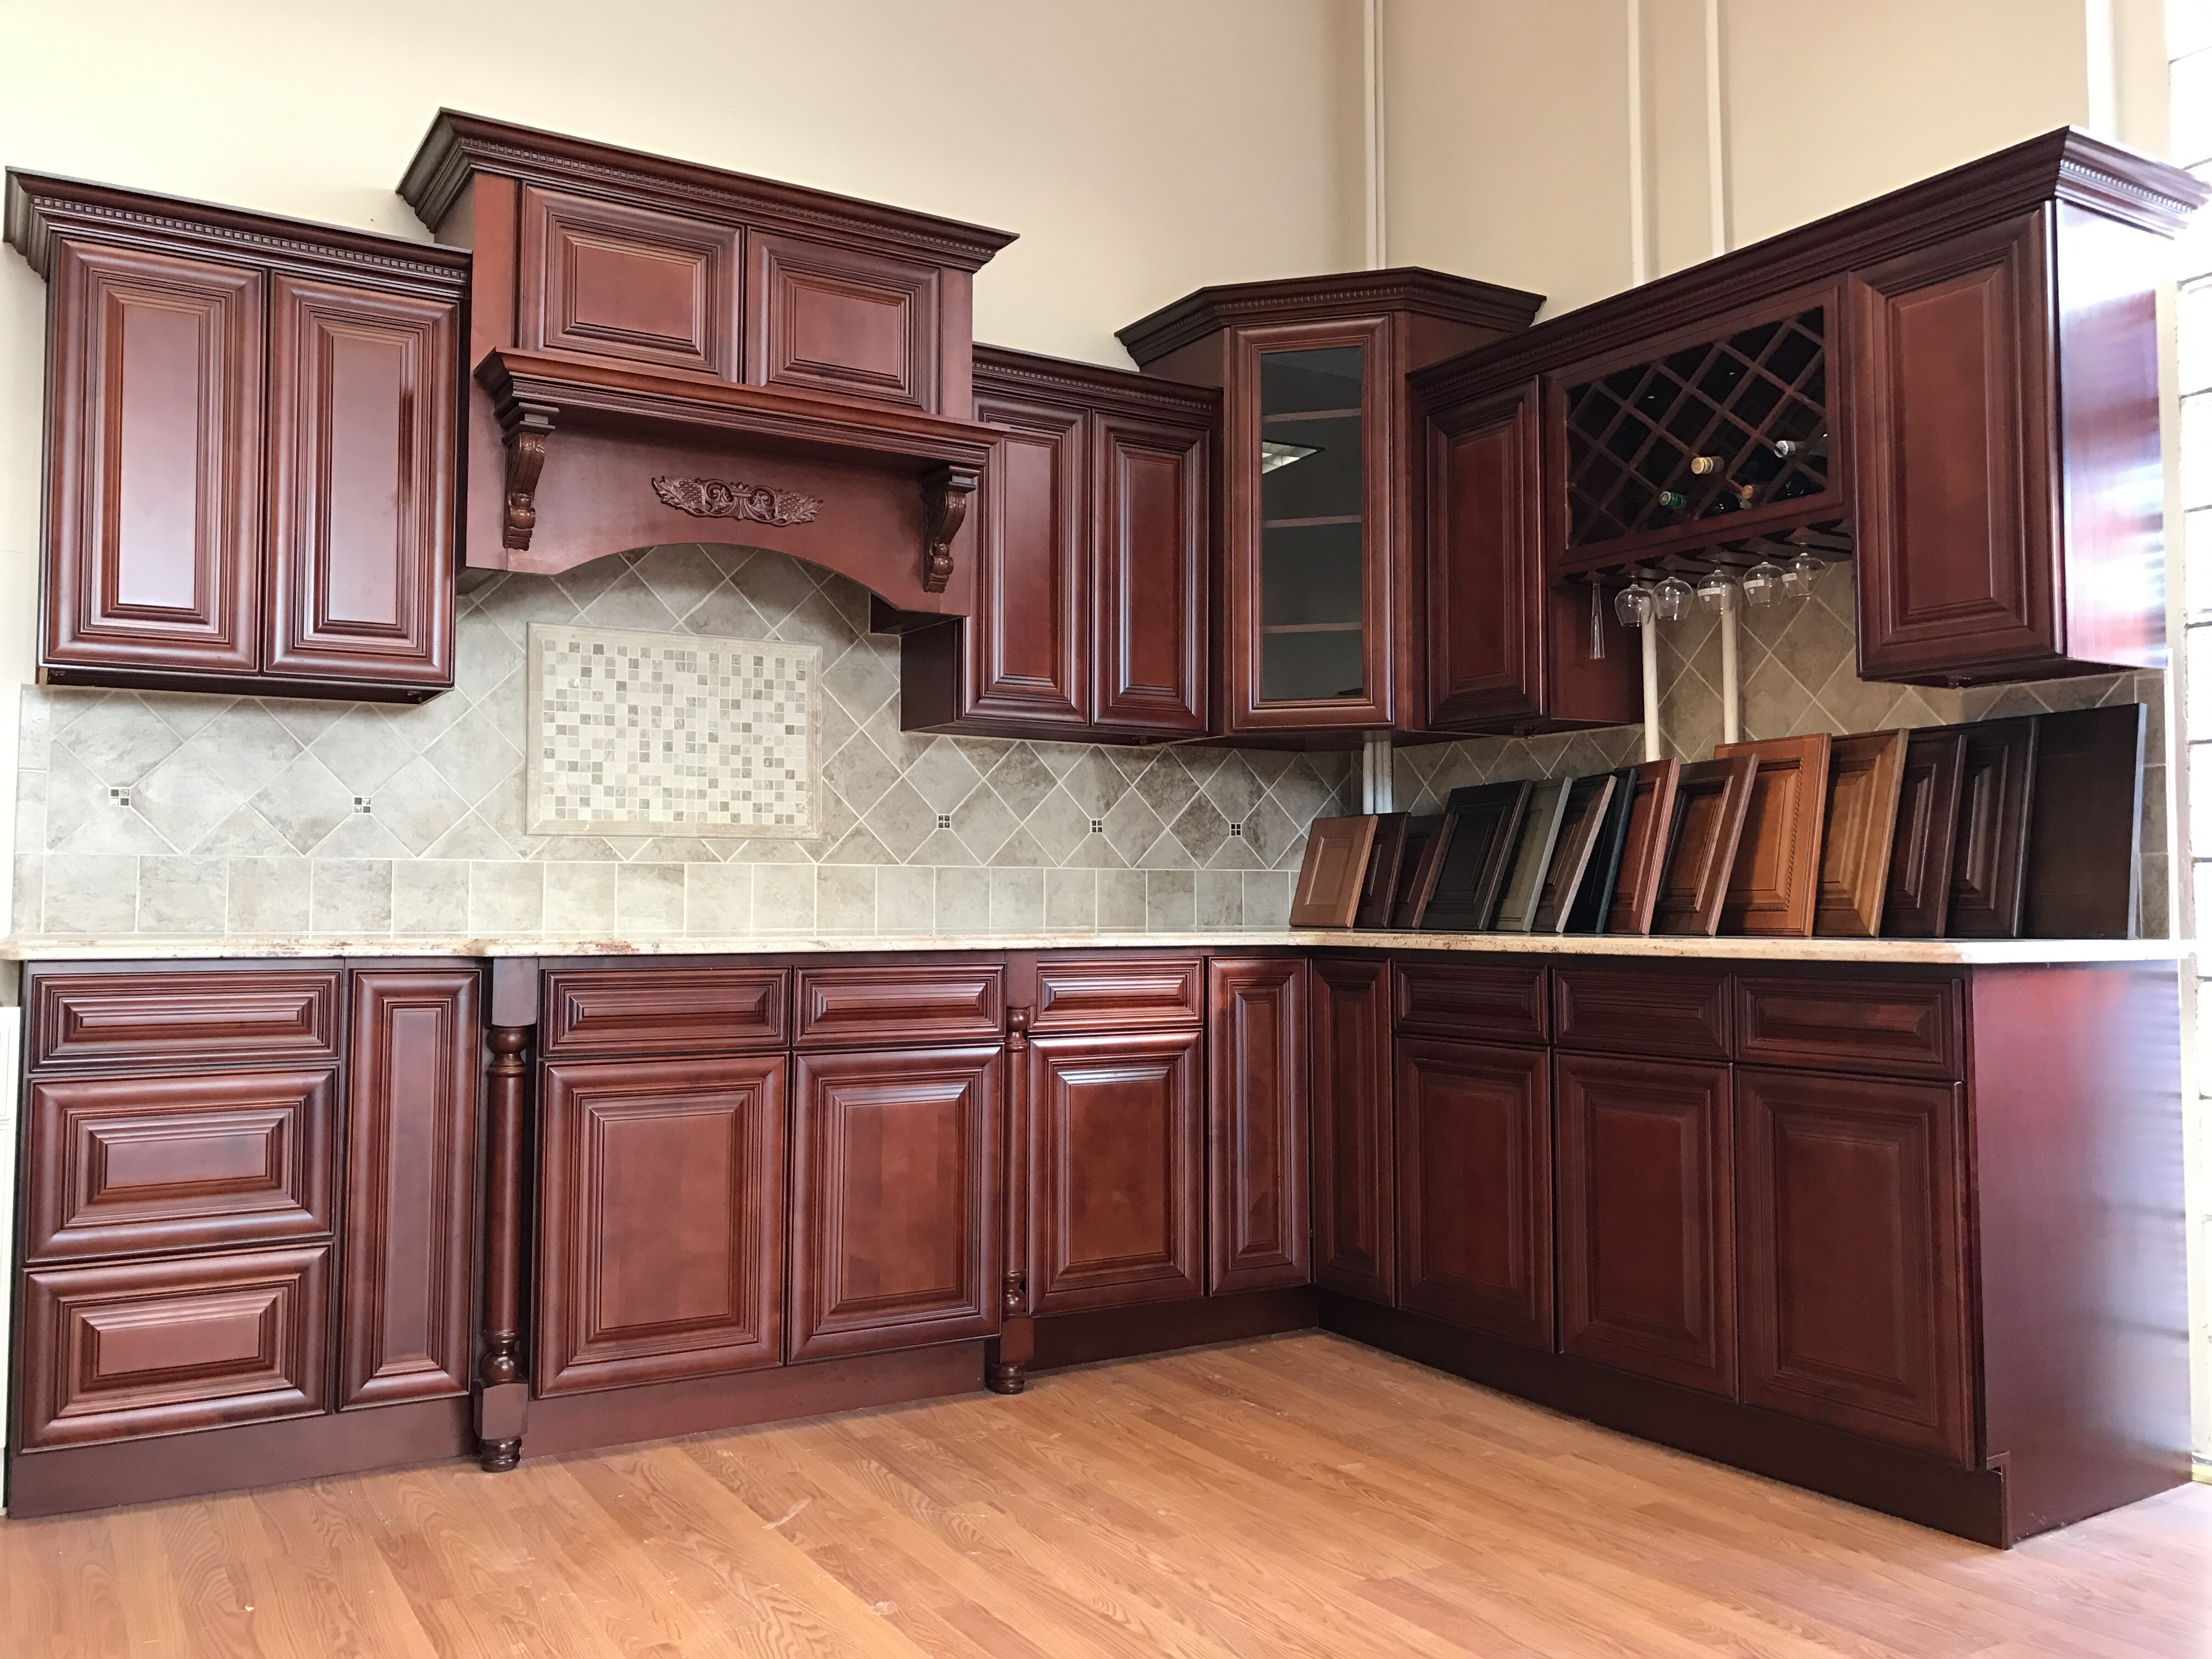 Mercure Kitchen And Bath Inc Cass St Trenton NJ YPcom - Kitchen cabinets trenton nj